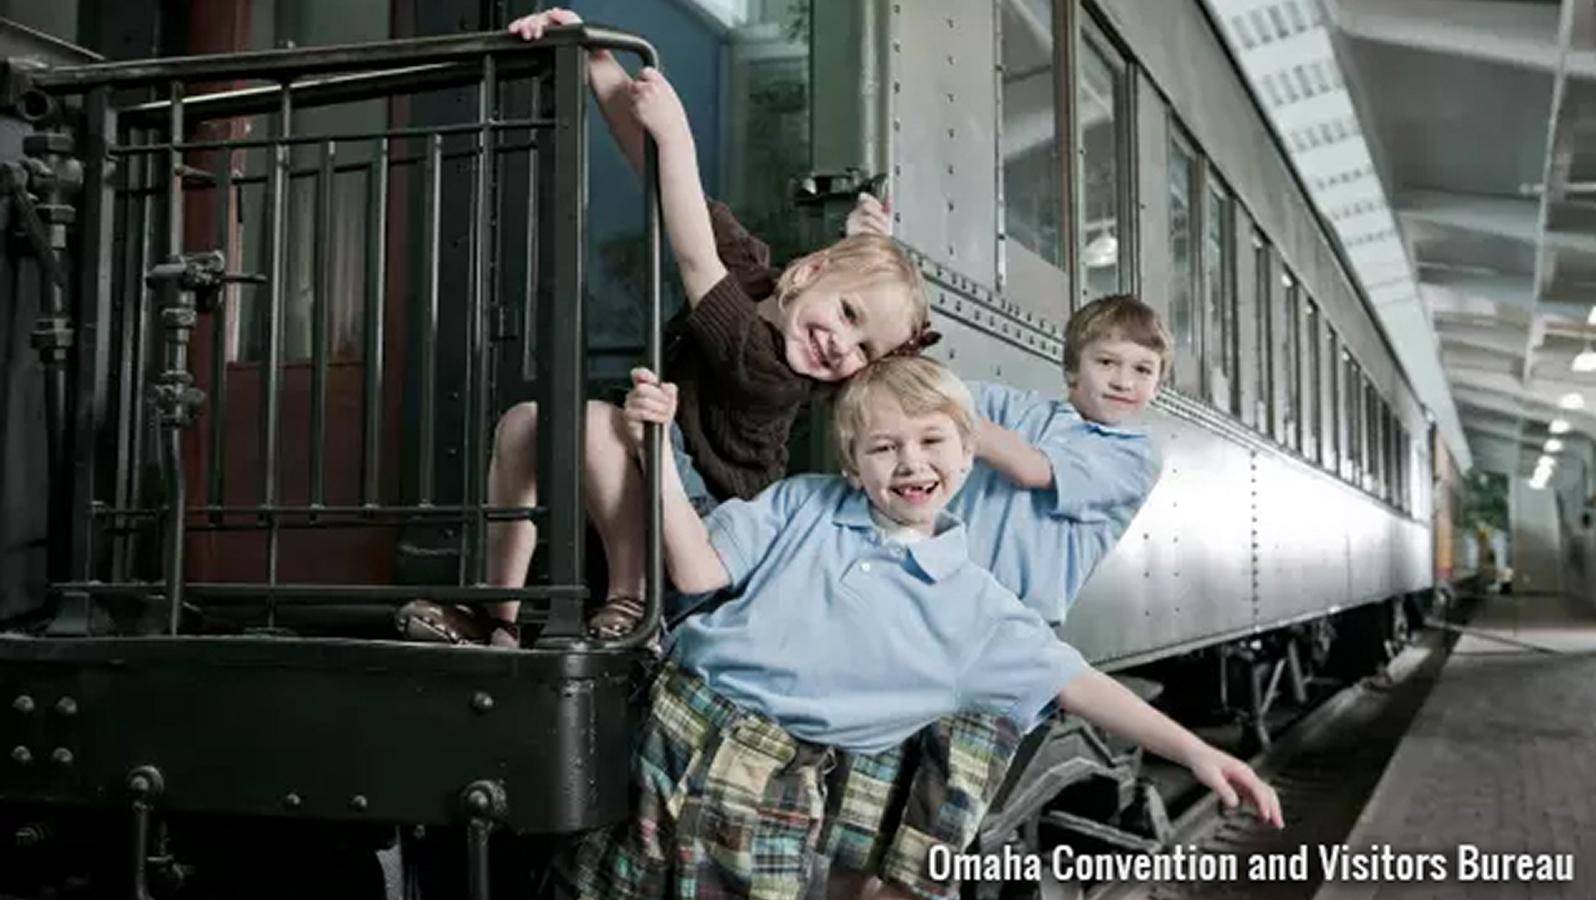 Children smiling on a train railing